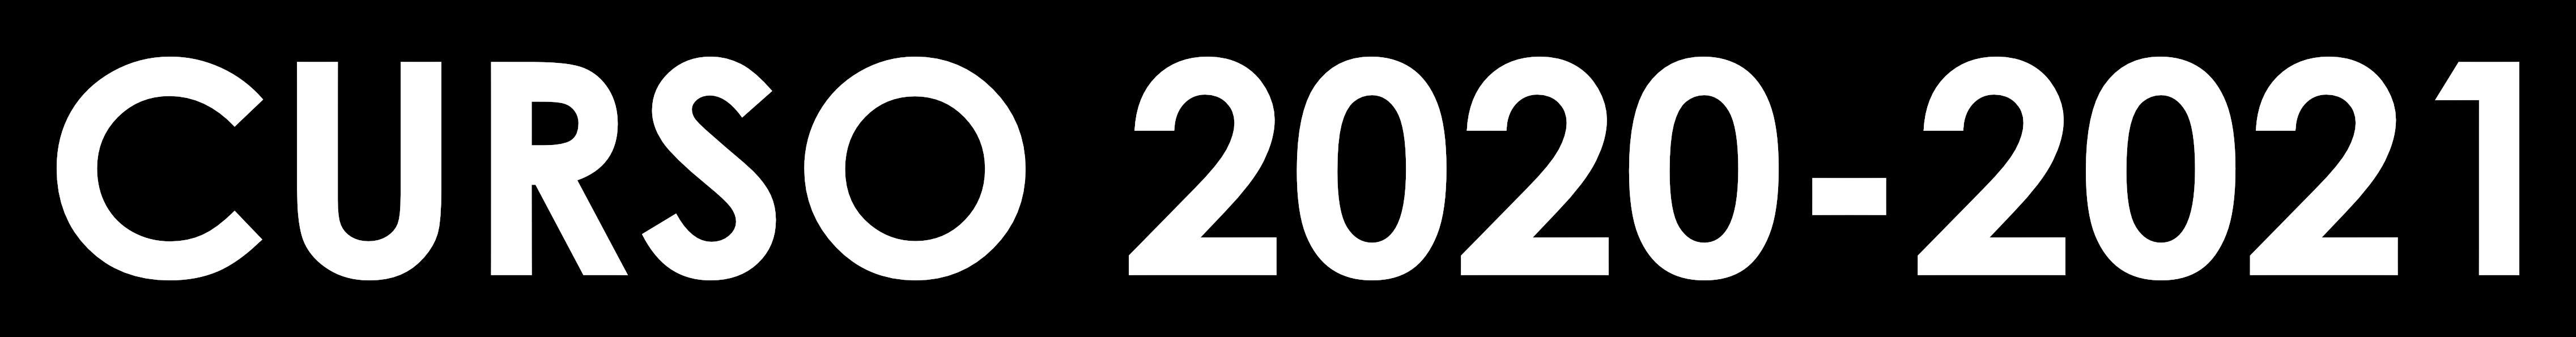 curso_2020_2021.png